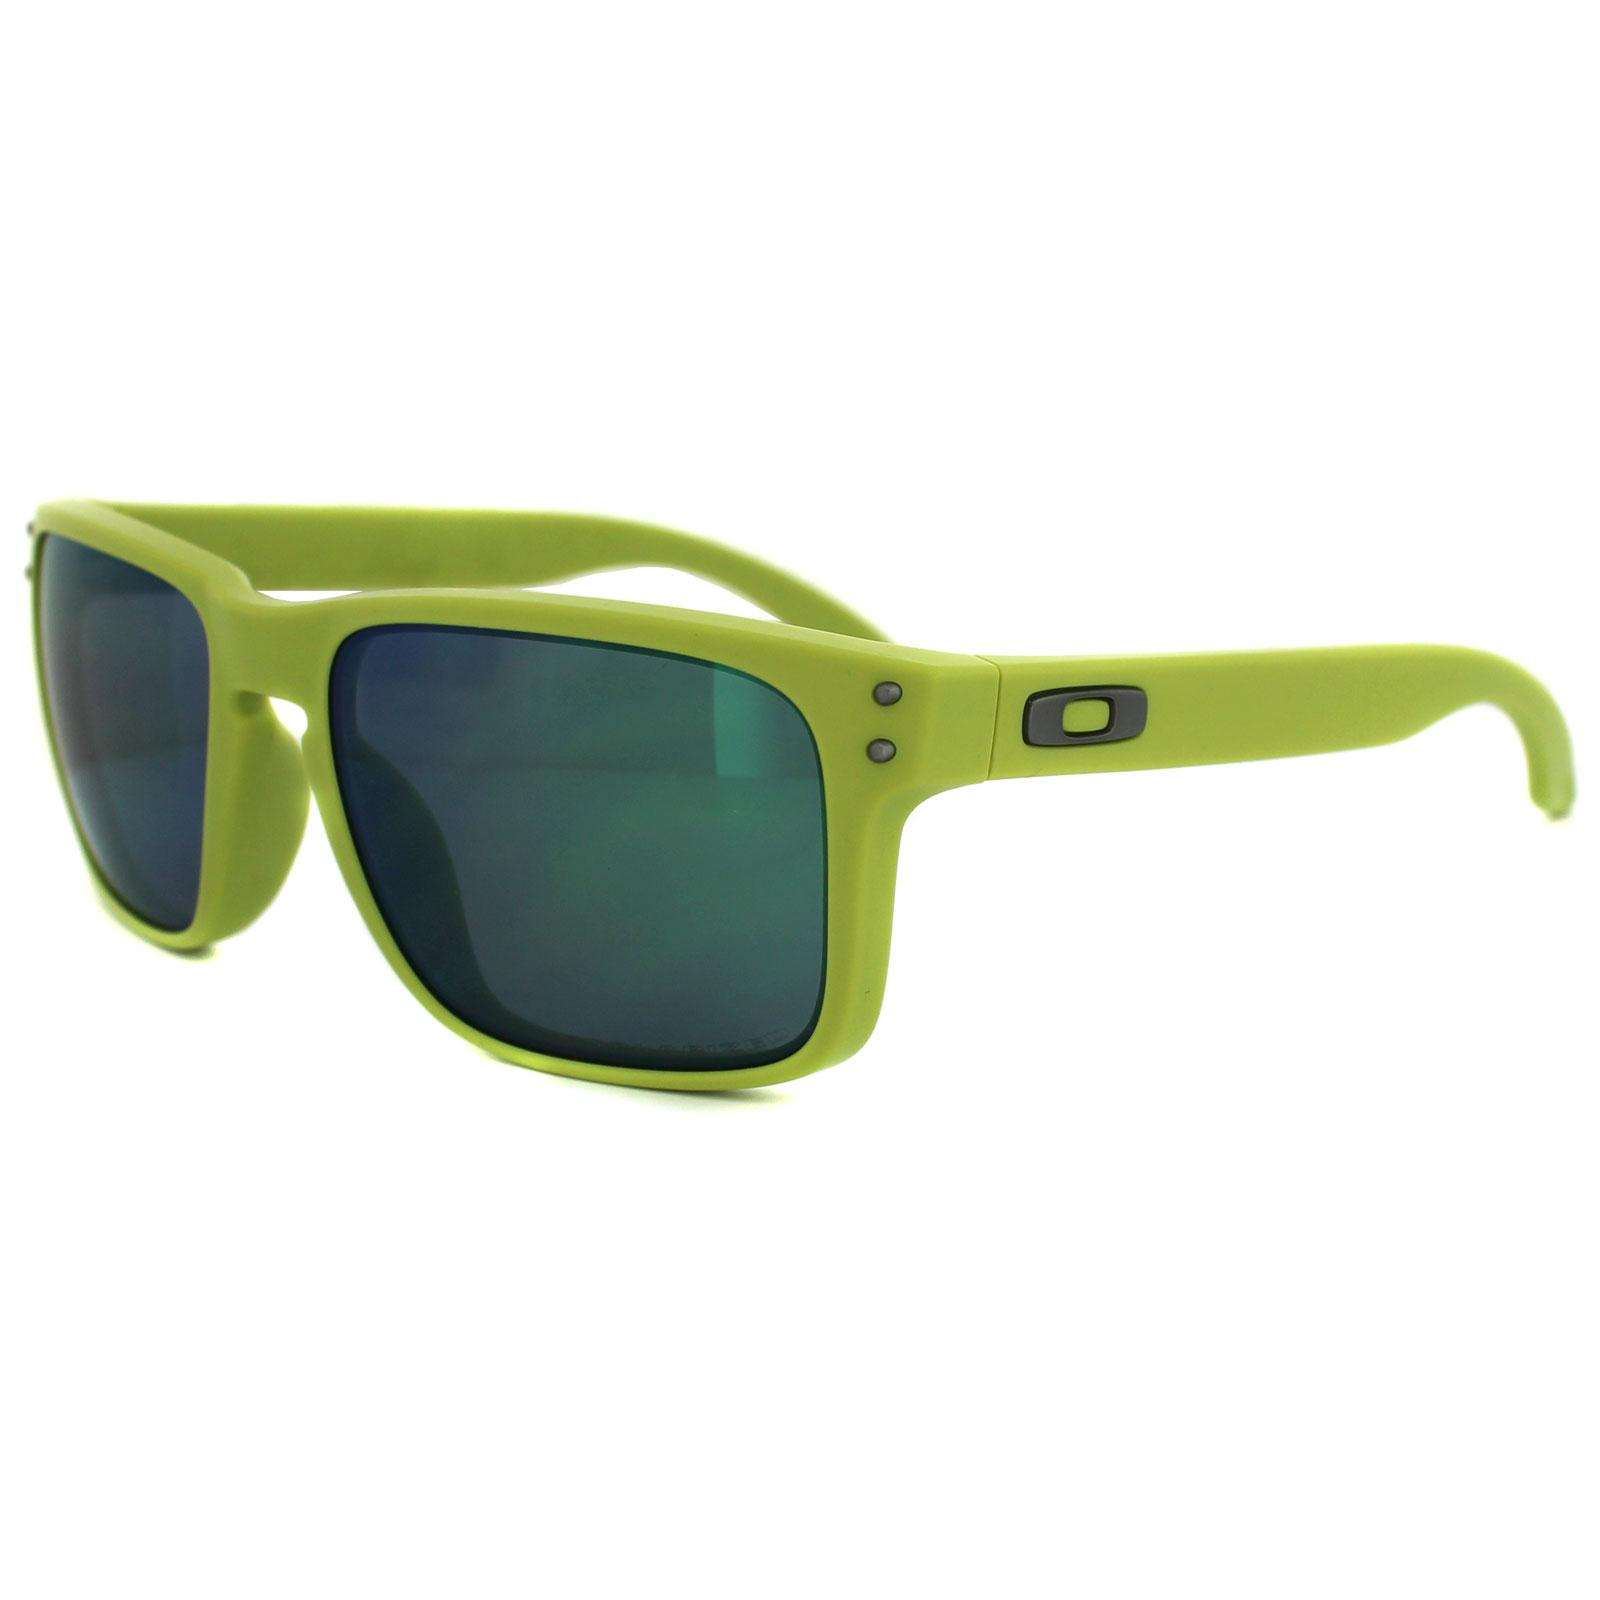 3b89e0815b Sentinel Oakley Sunglasses Holbrook OO9102-72 Matte Fern Jade Iridium  Polarized